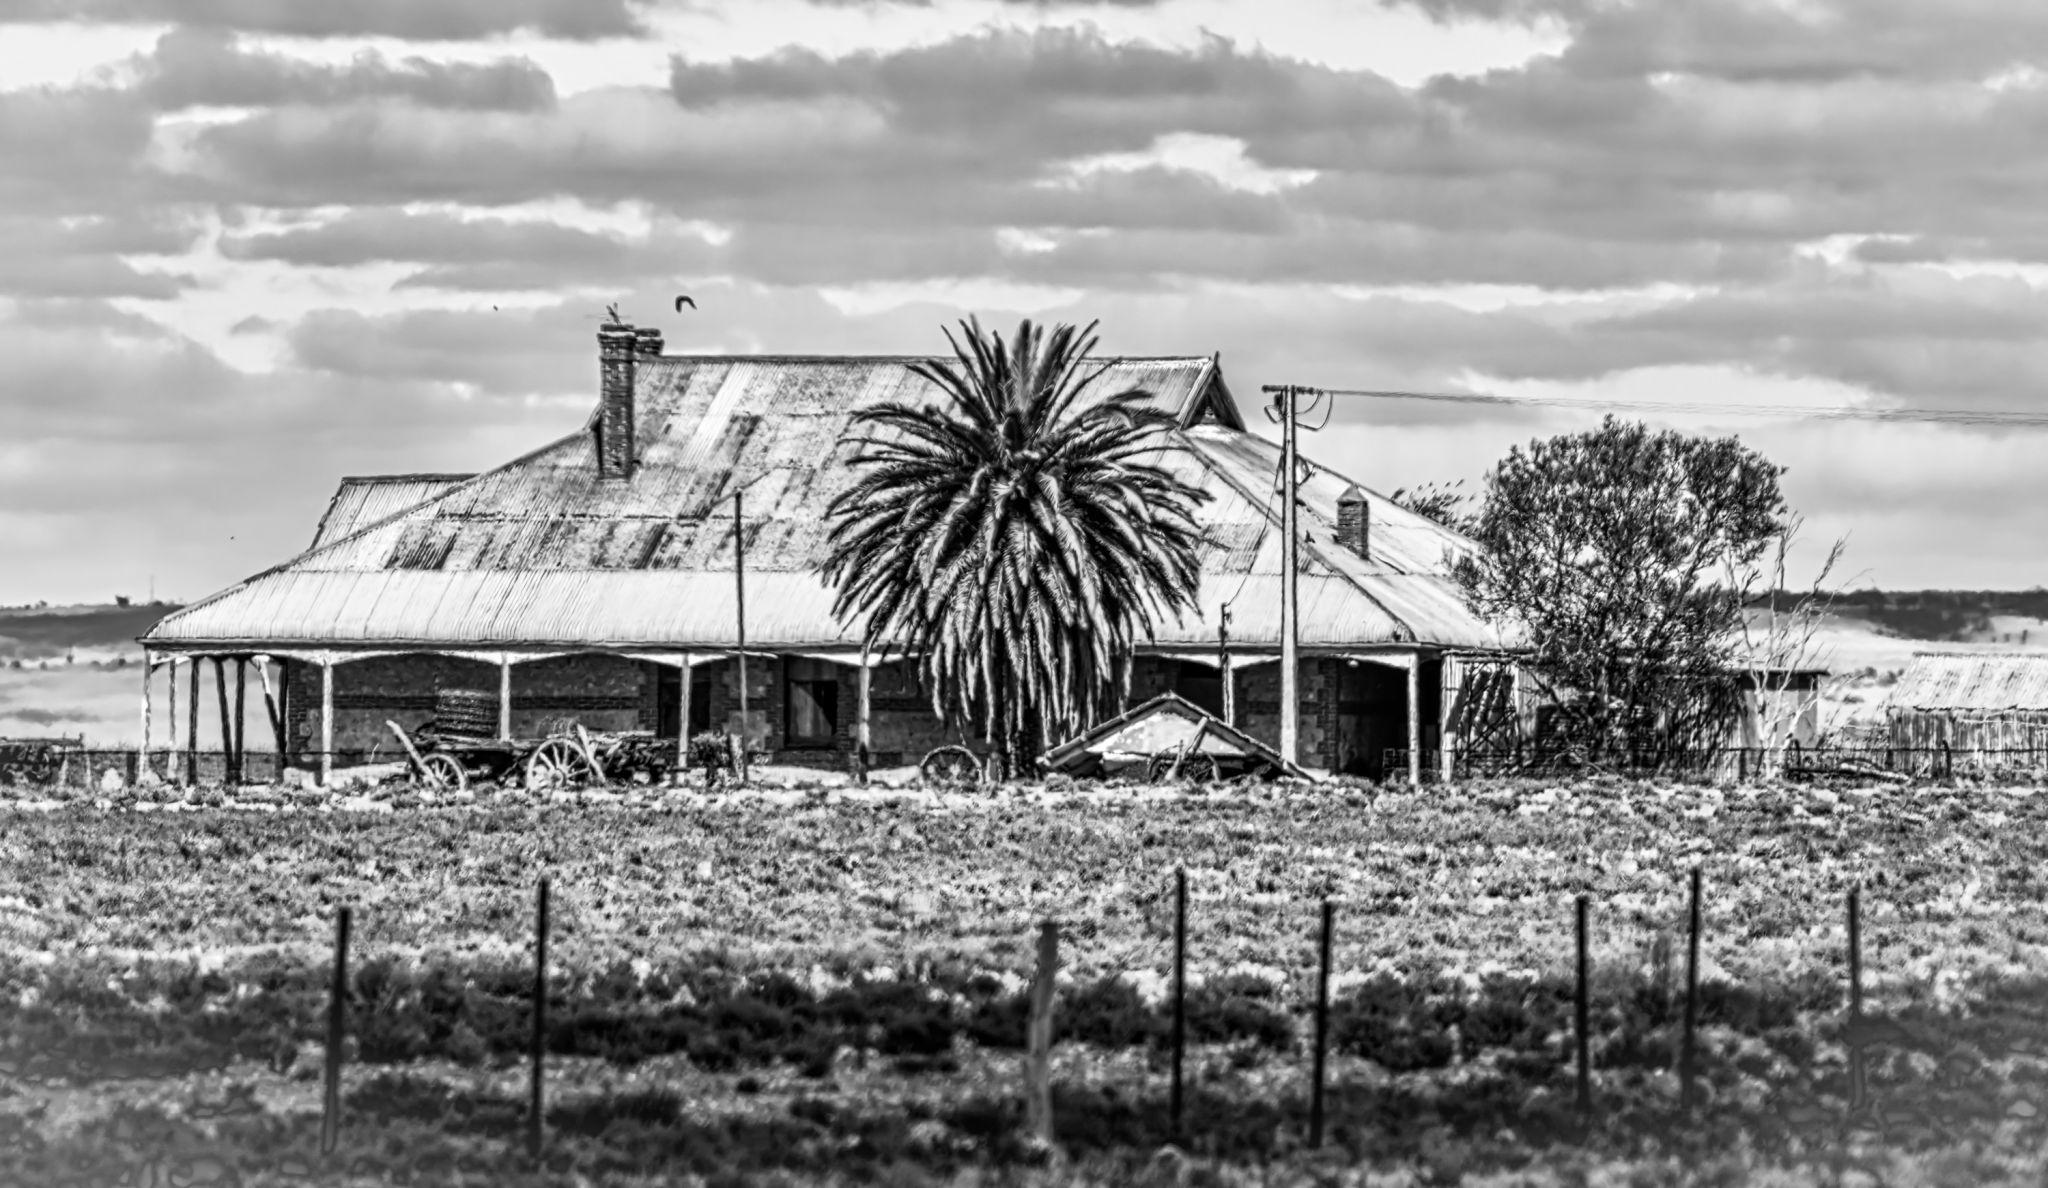 Homestead, Port Wakefield, South Australia, Australia